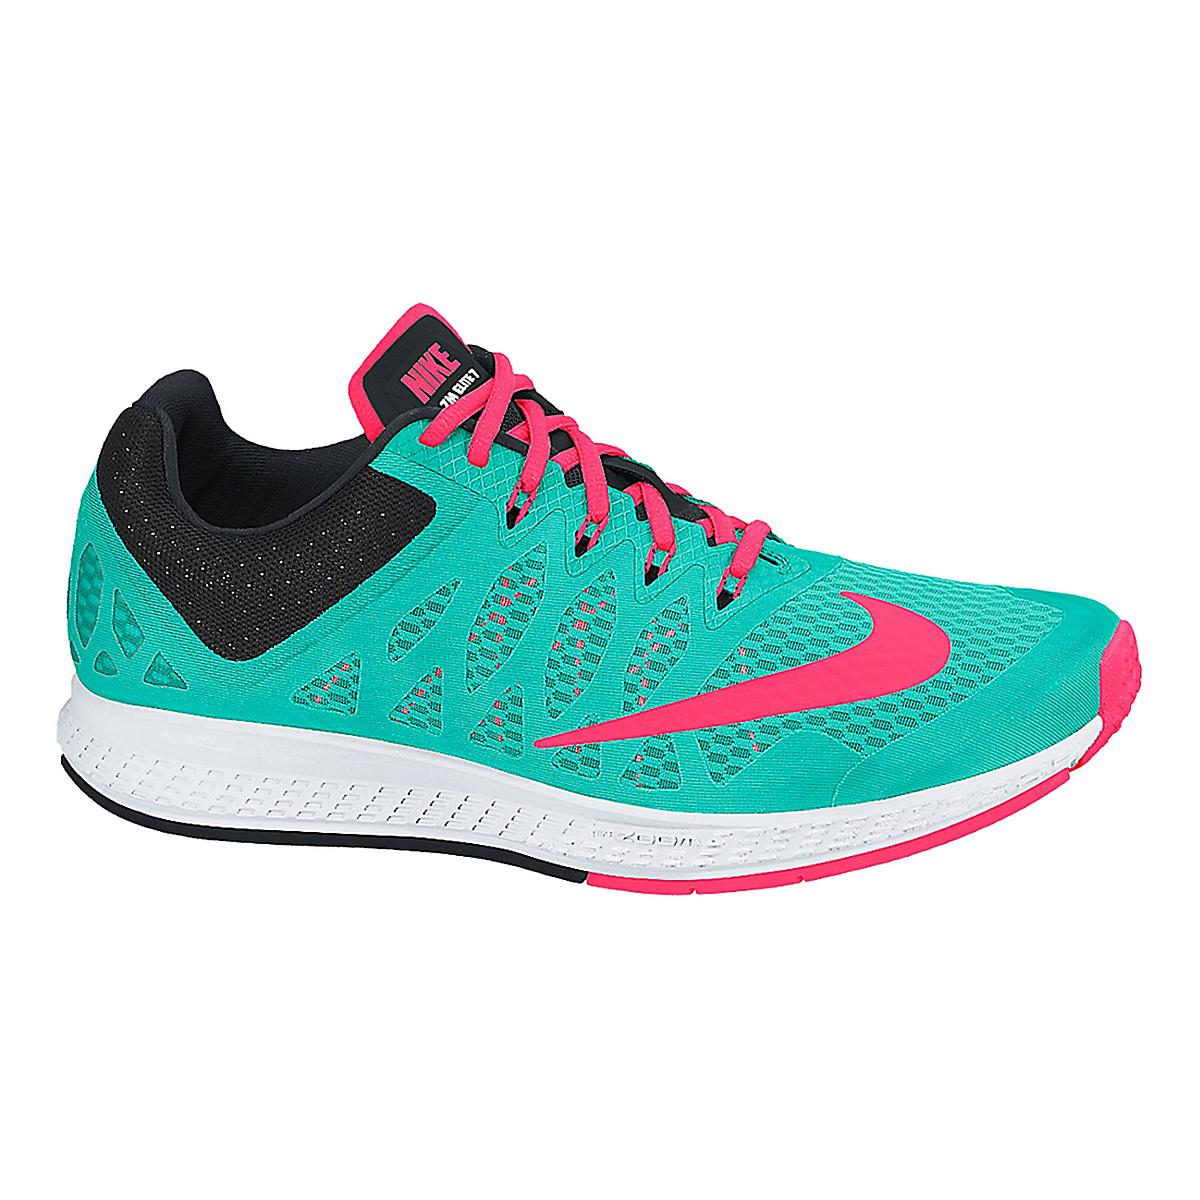 Womens Nike Air Zoom Elite 7 Running Shoe at Road Runner Sports 066ec5ede